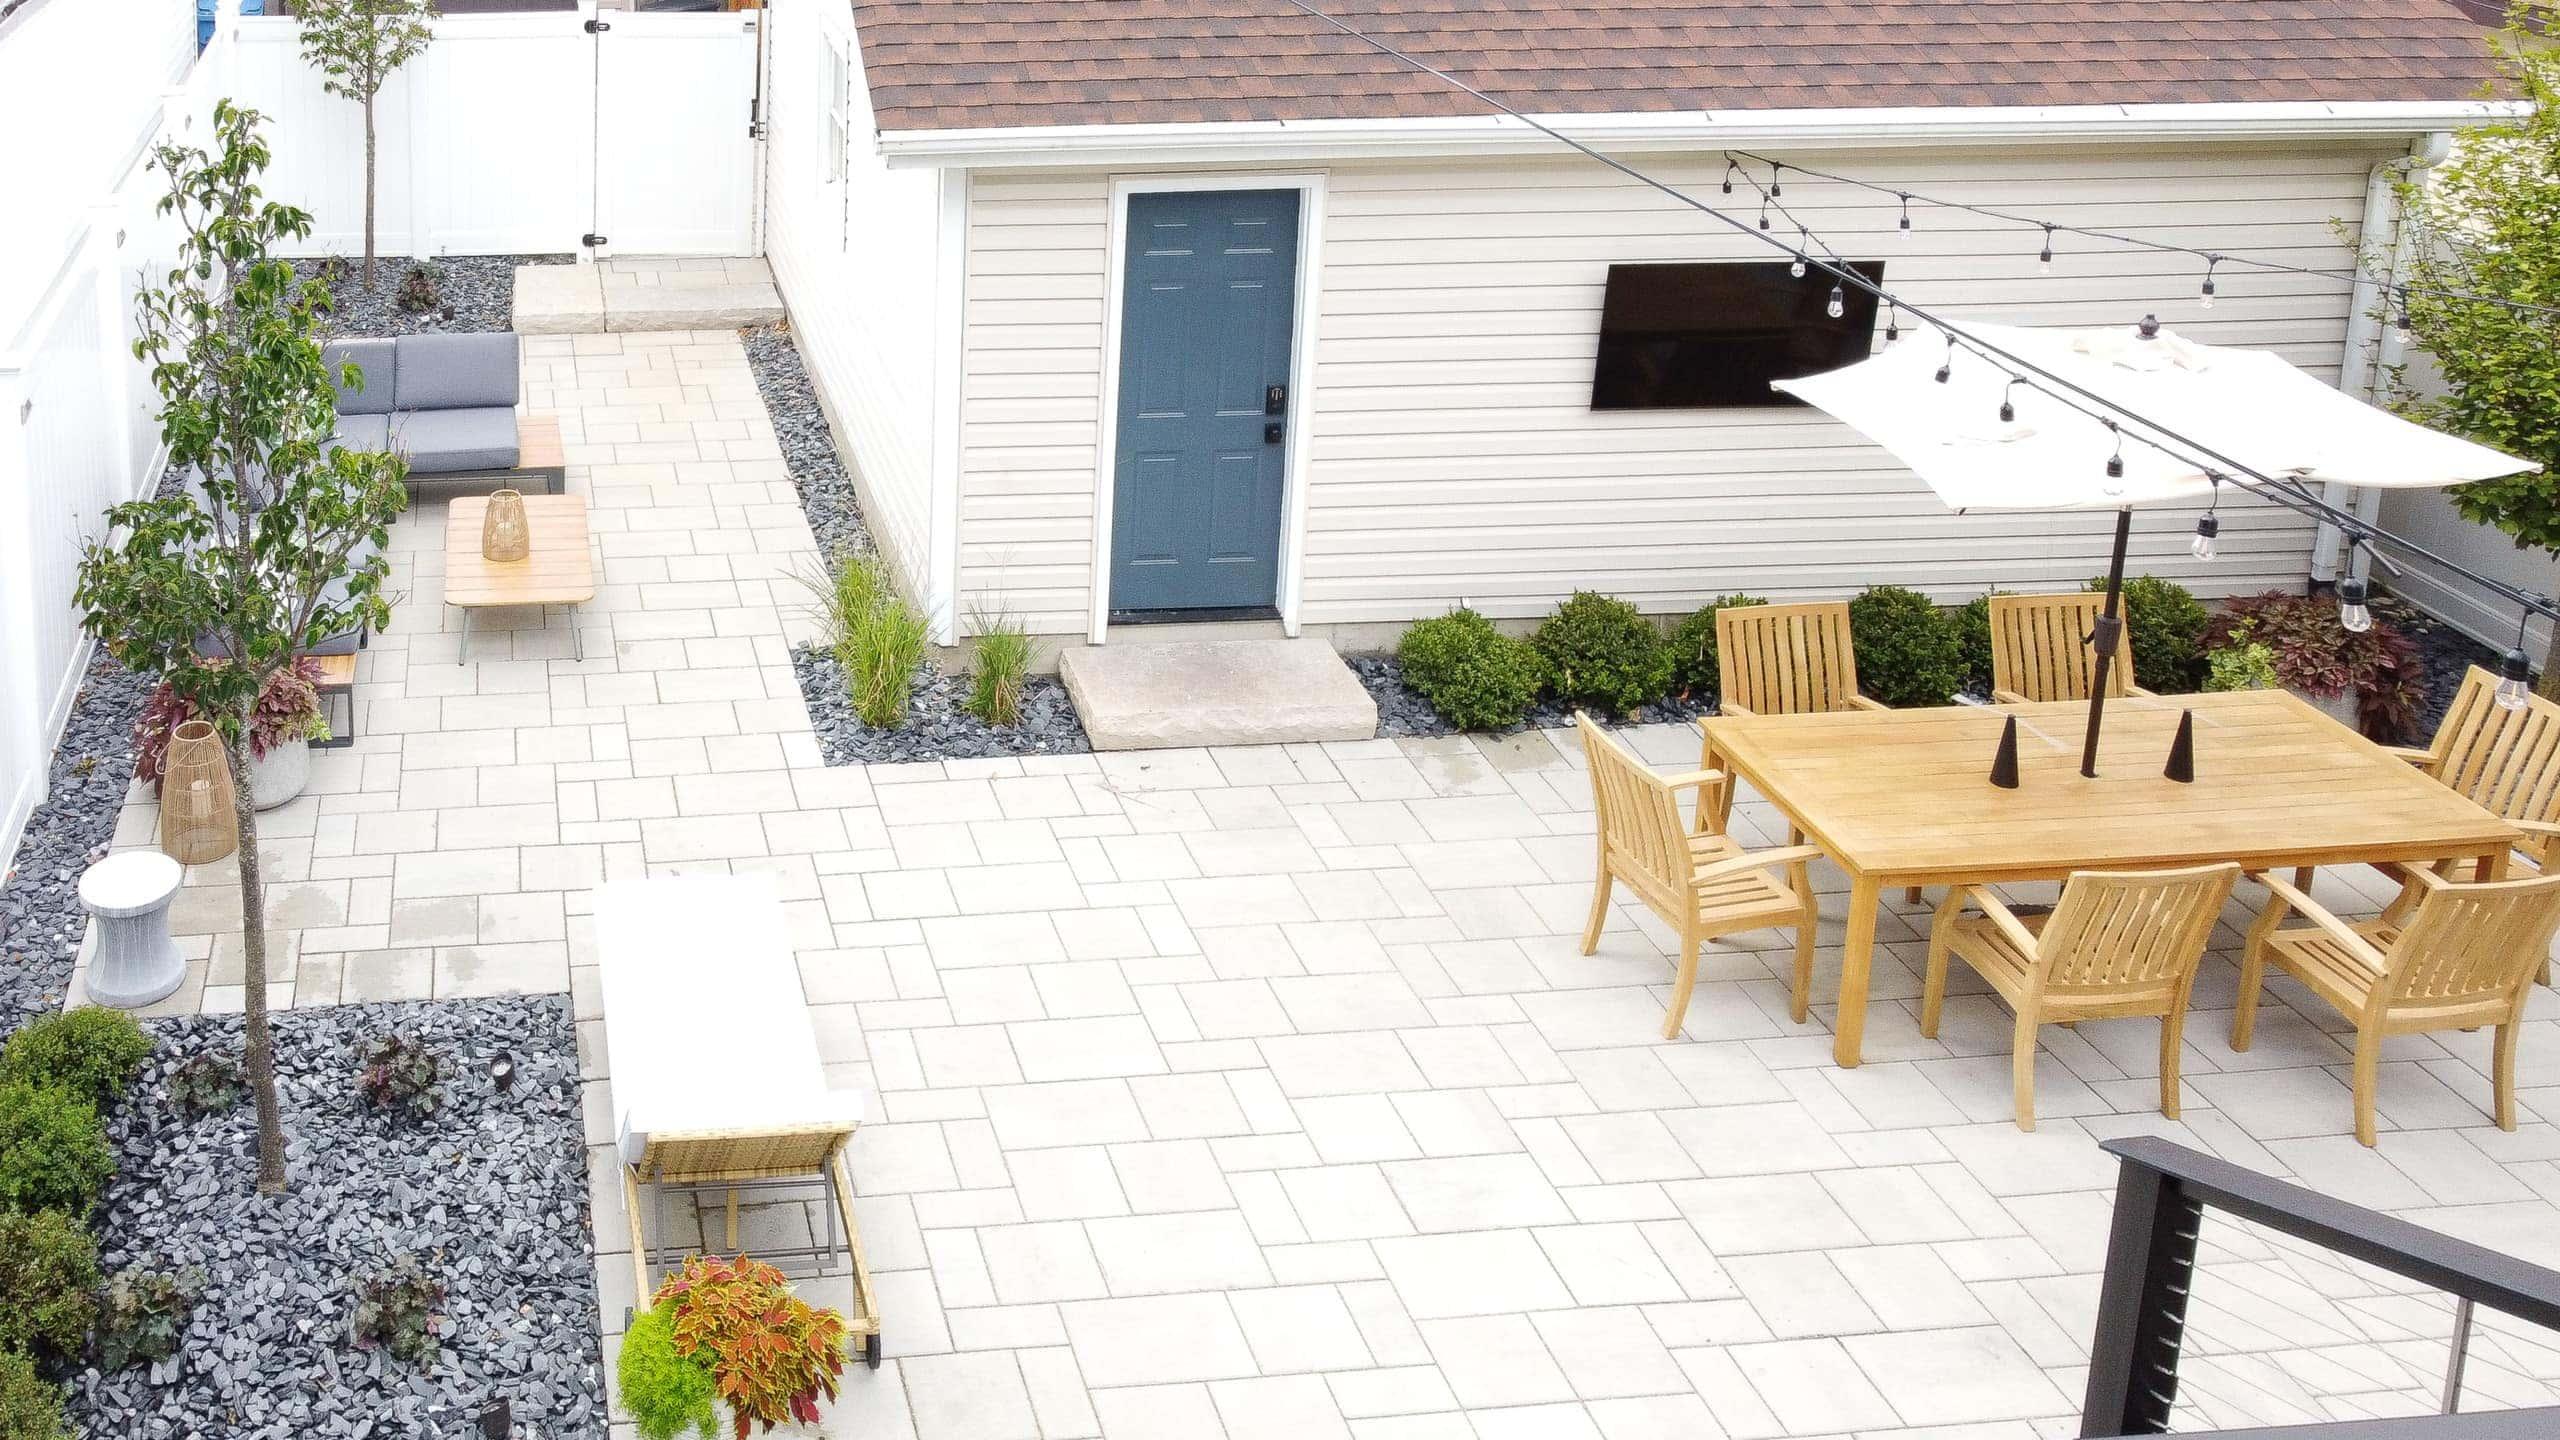 Adding stone to our backyard